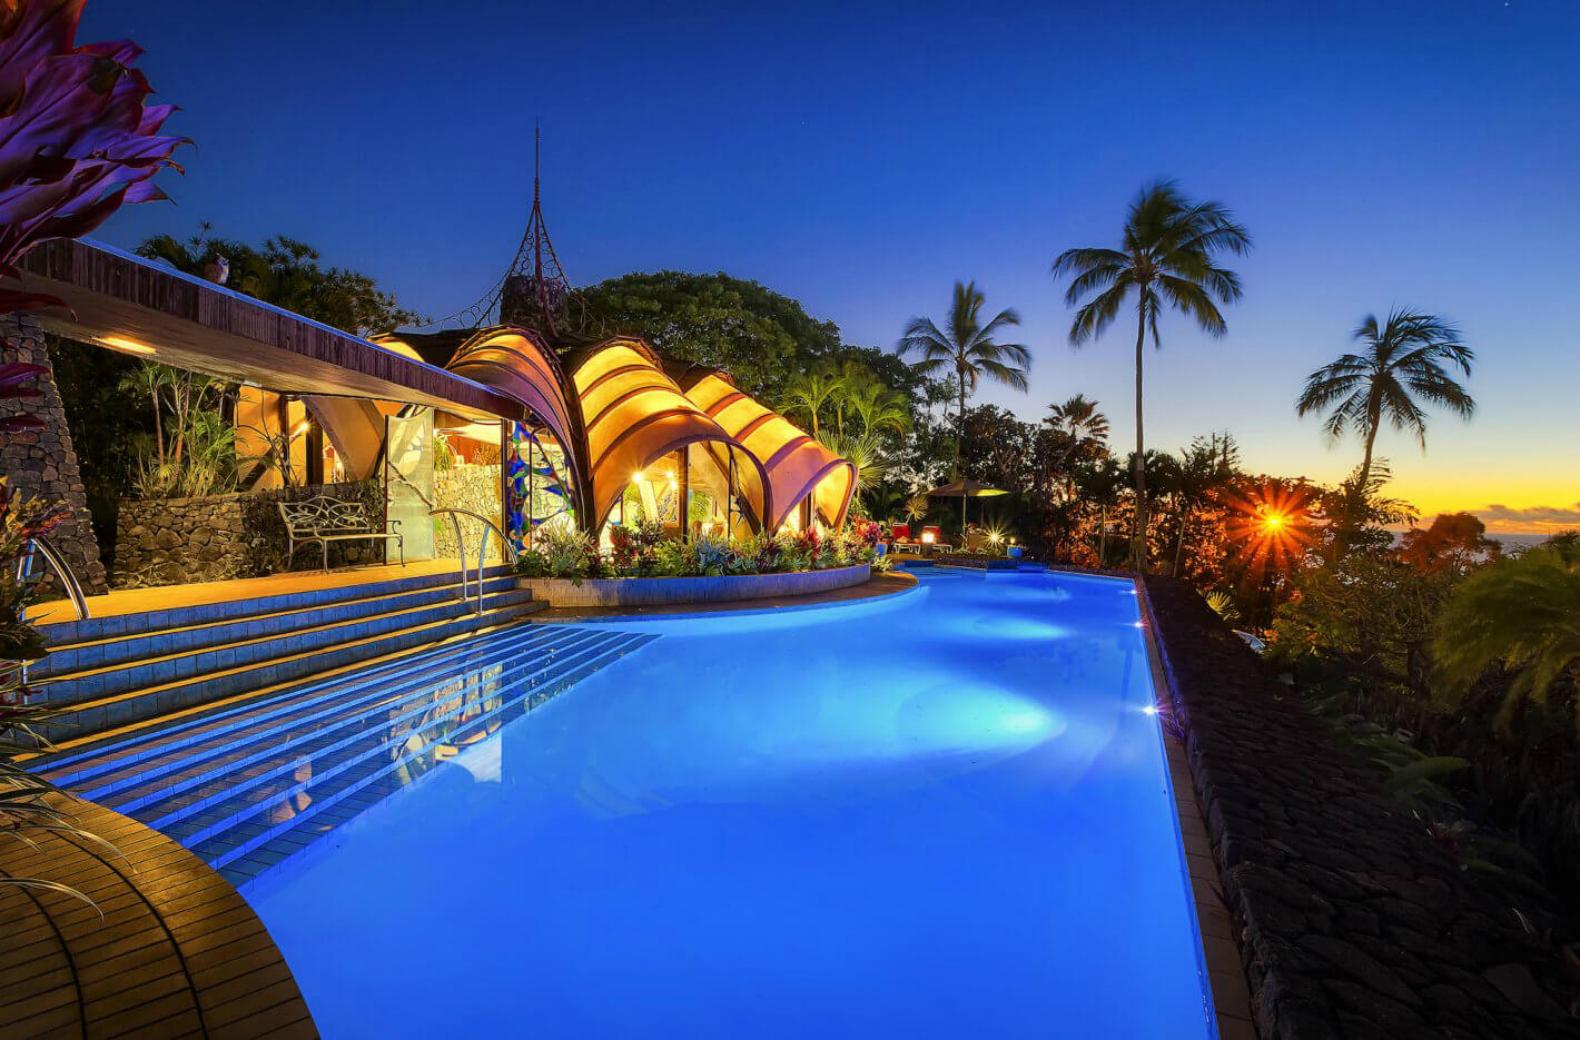 La piscina / Onion House